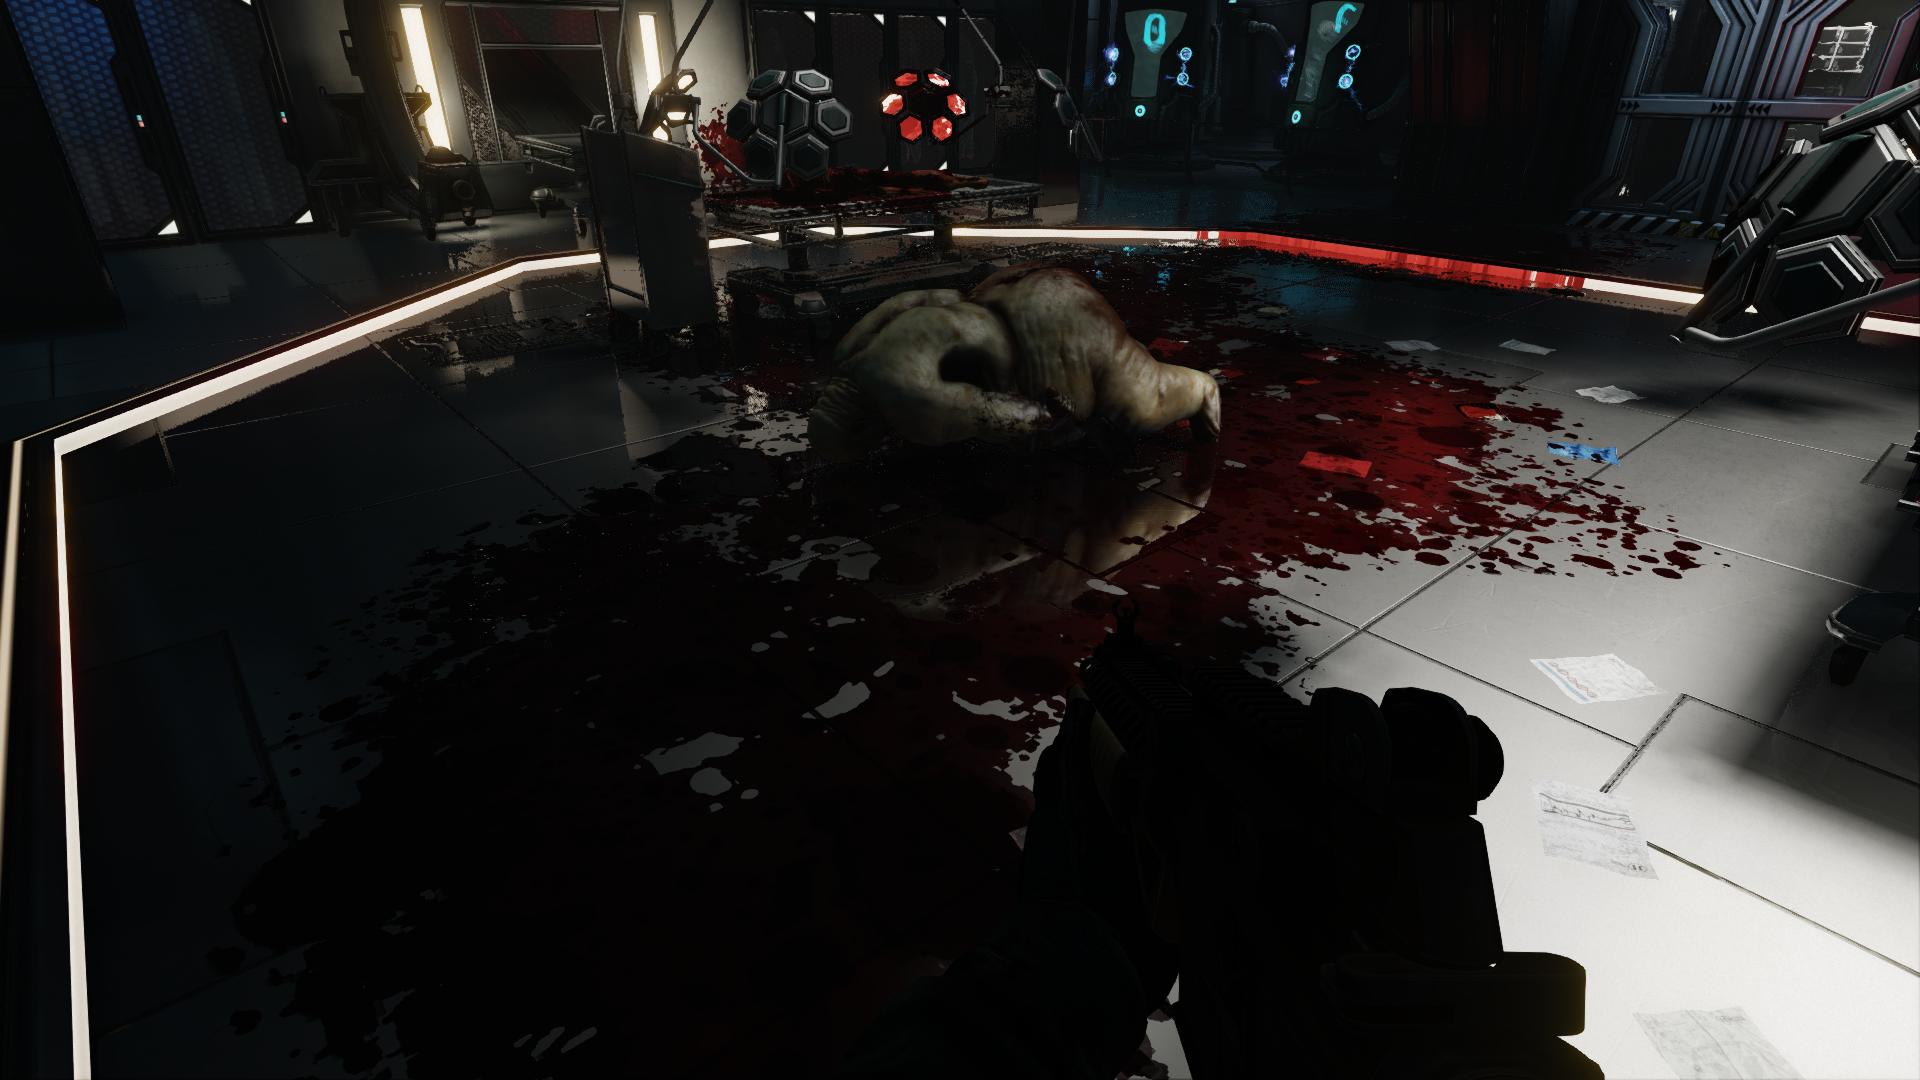 GeForce.com Killing Floor 2 Screen Space Reflections ...